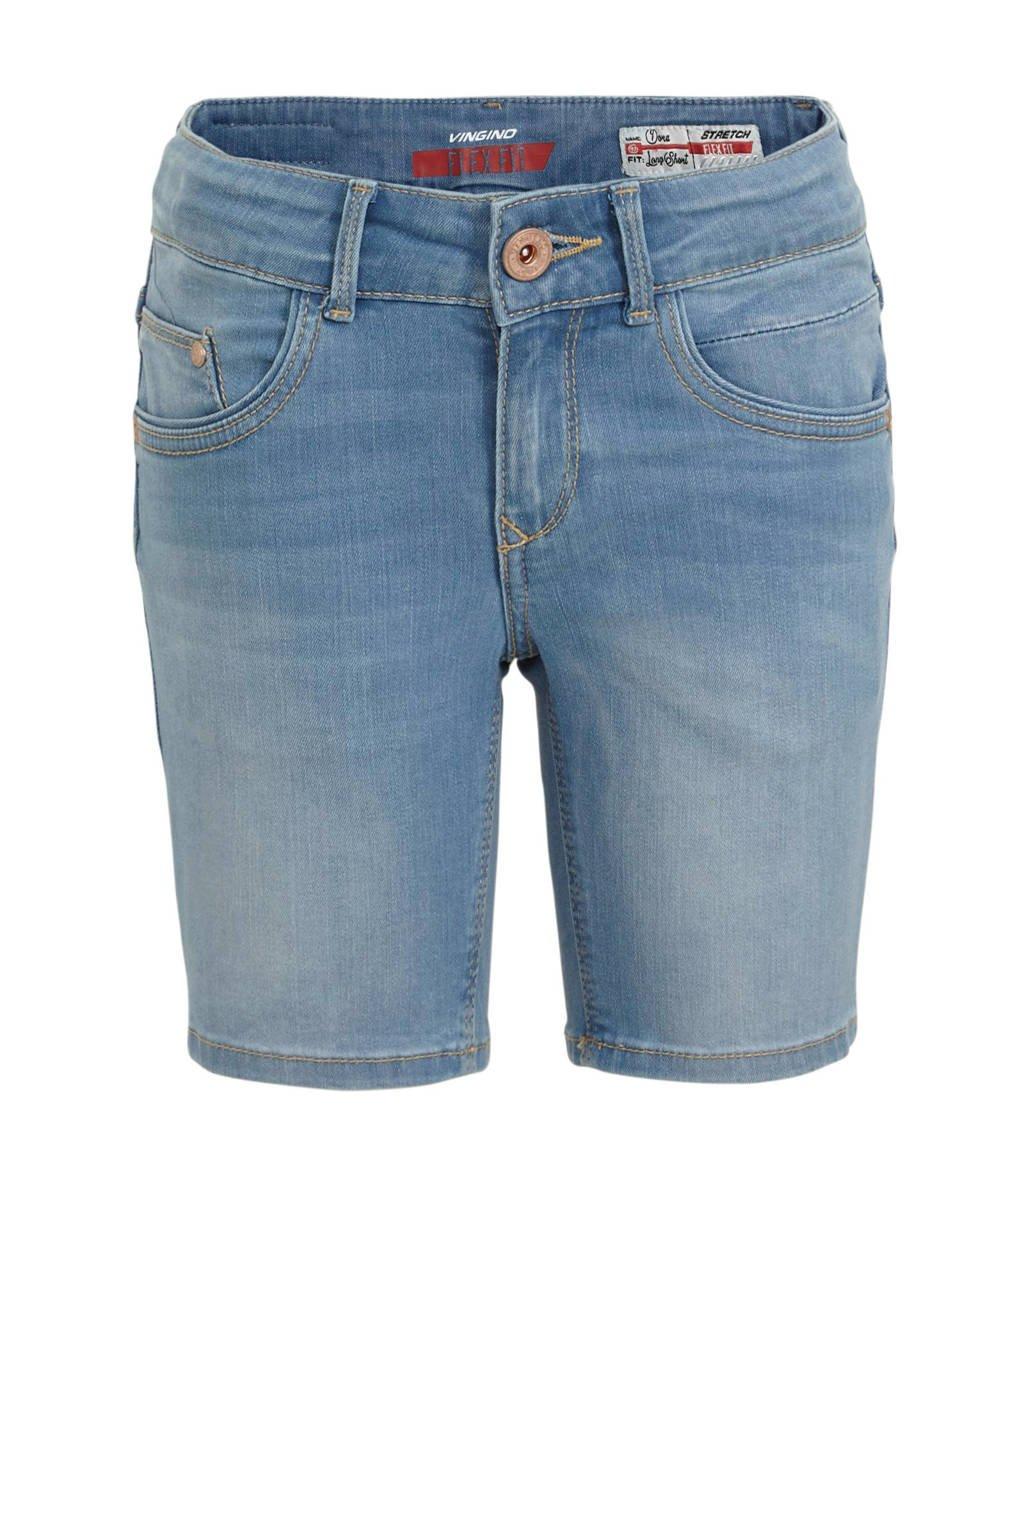 Vingino skinny jeans short Dora light indigo, Light Indigo